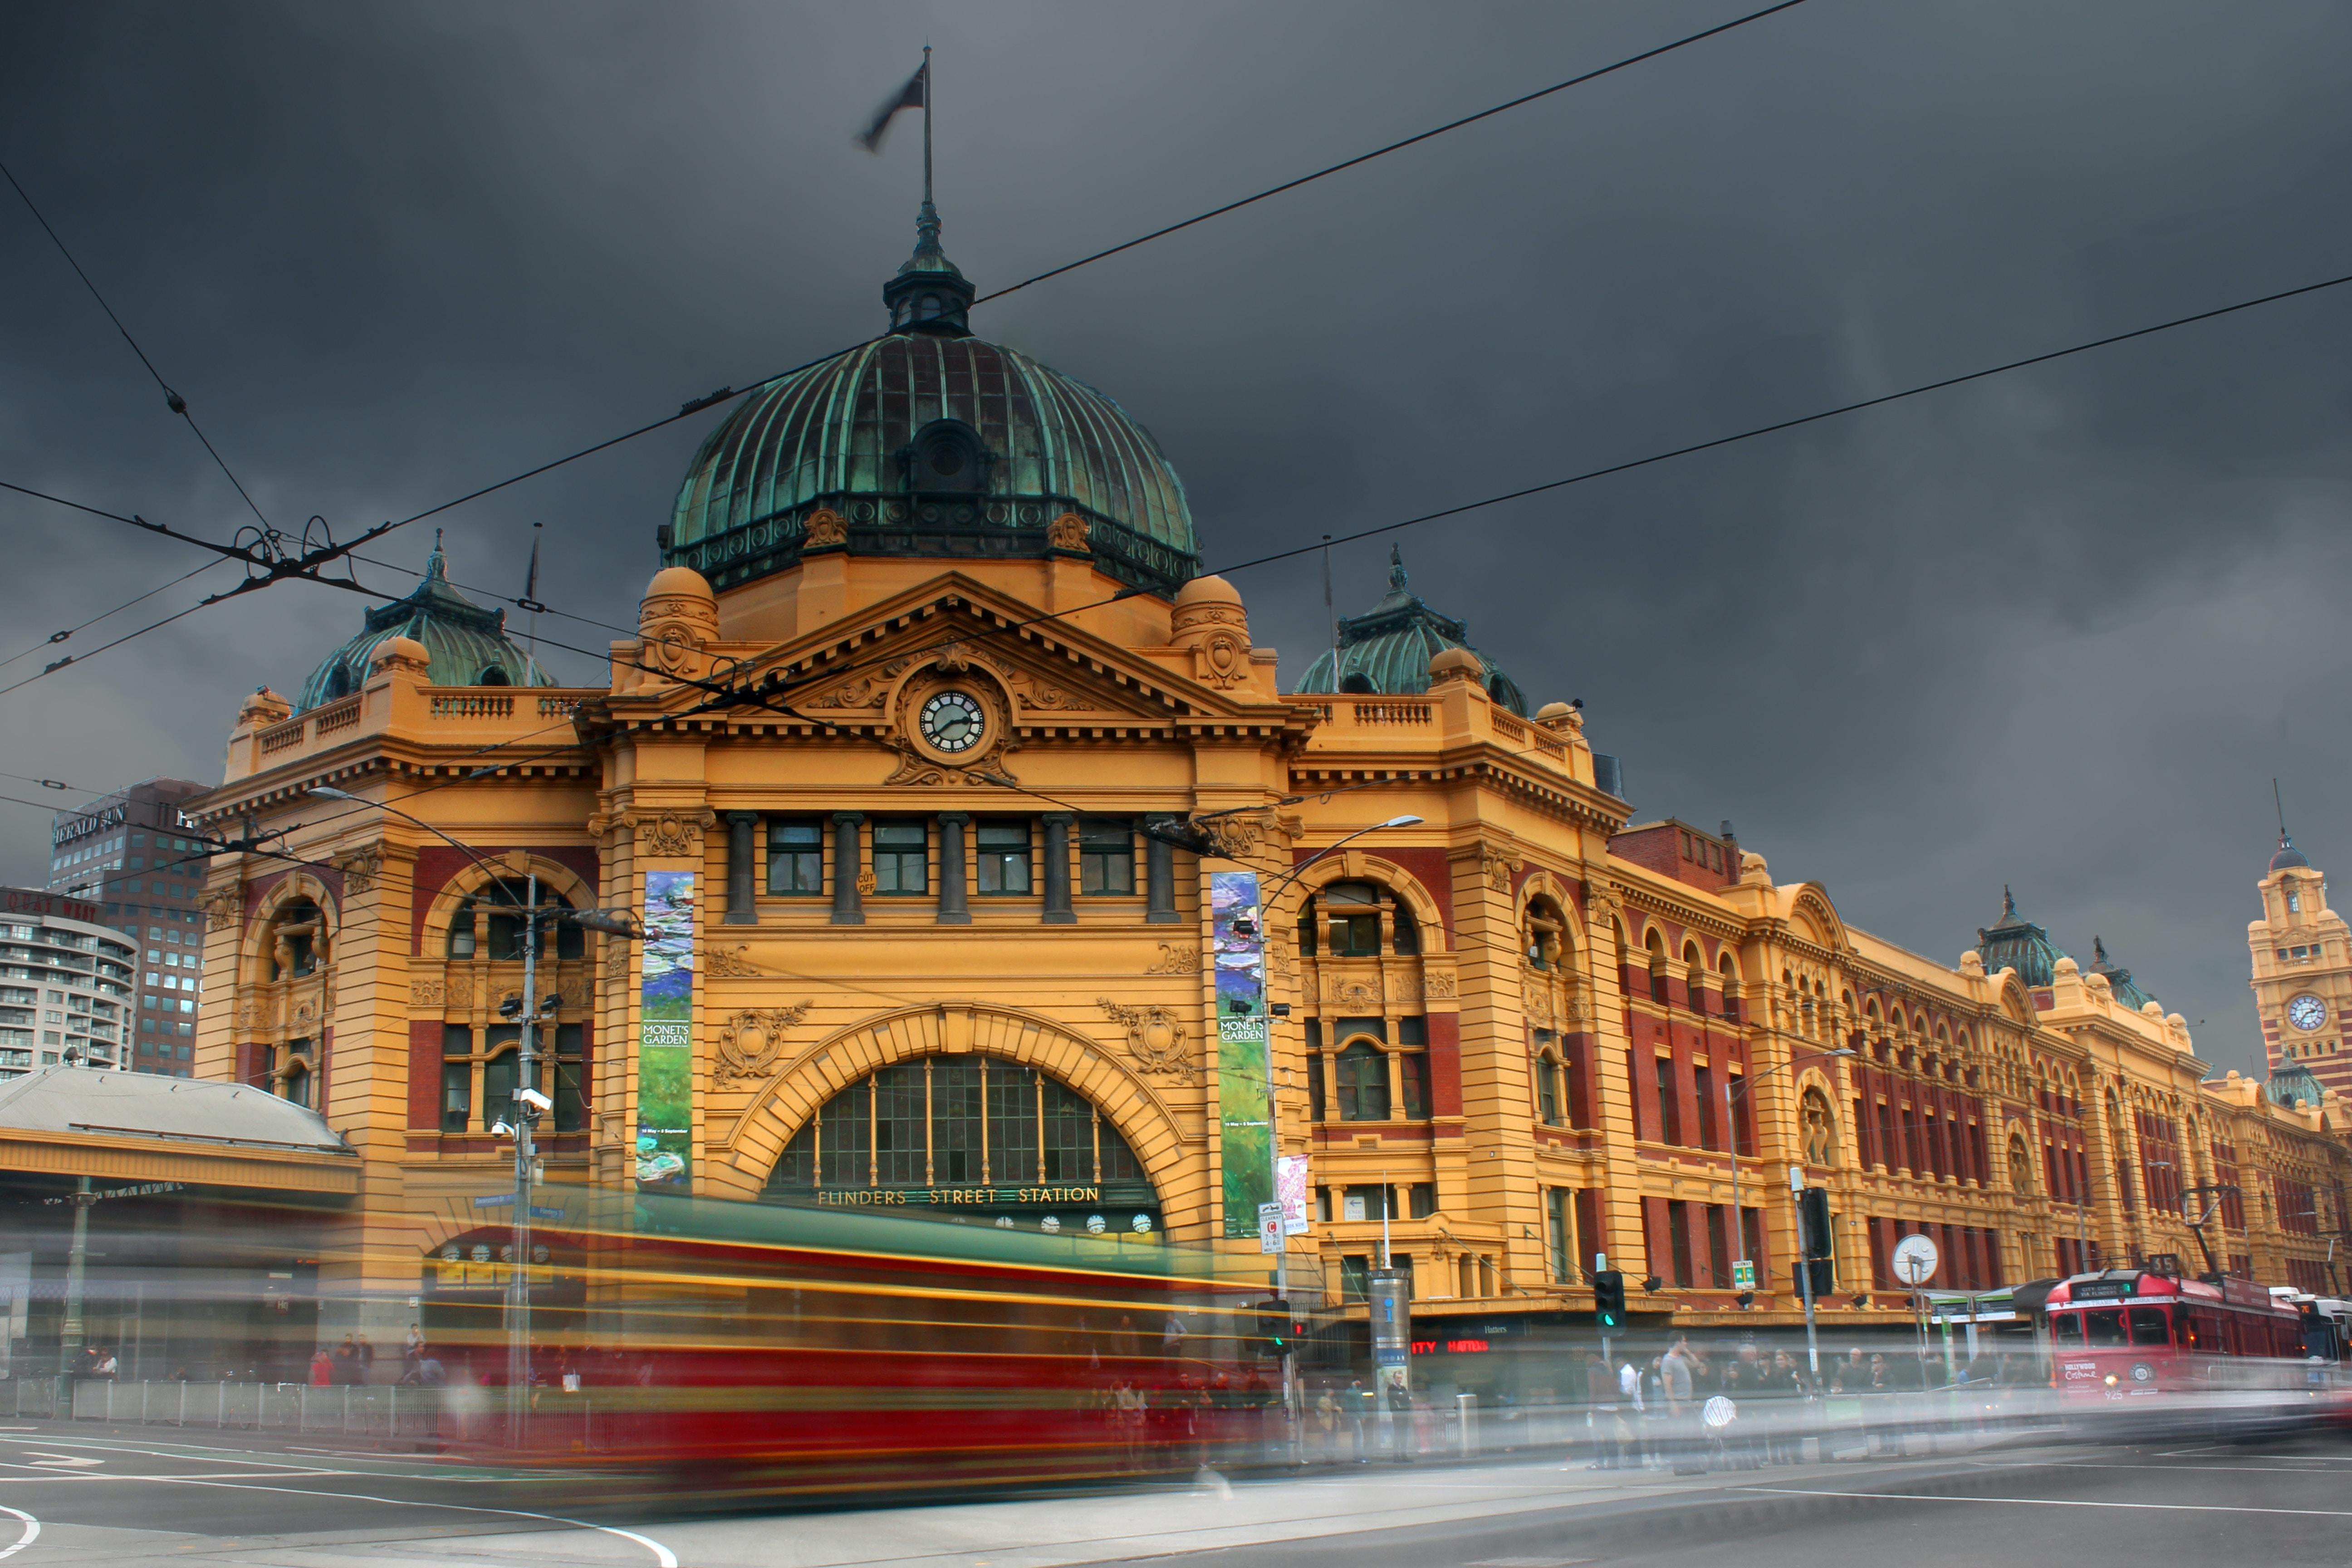 A blurred shot of traffic in motion on Flinders Street in Melbourne